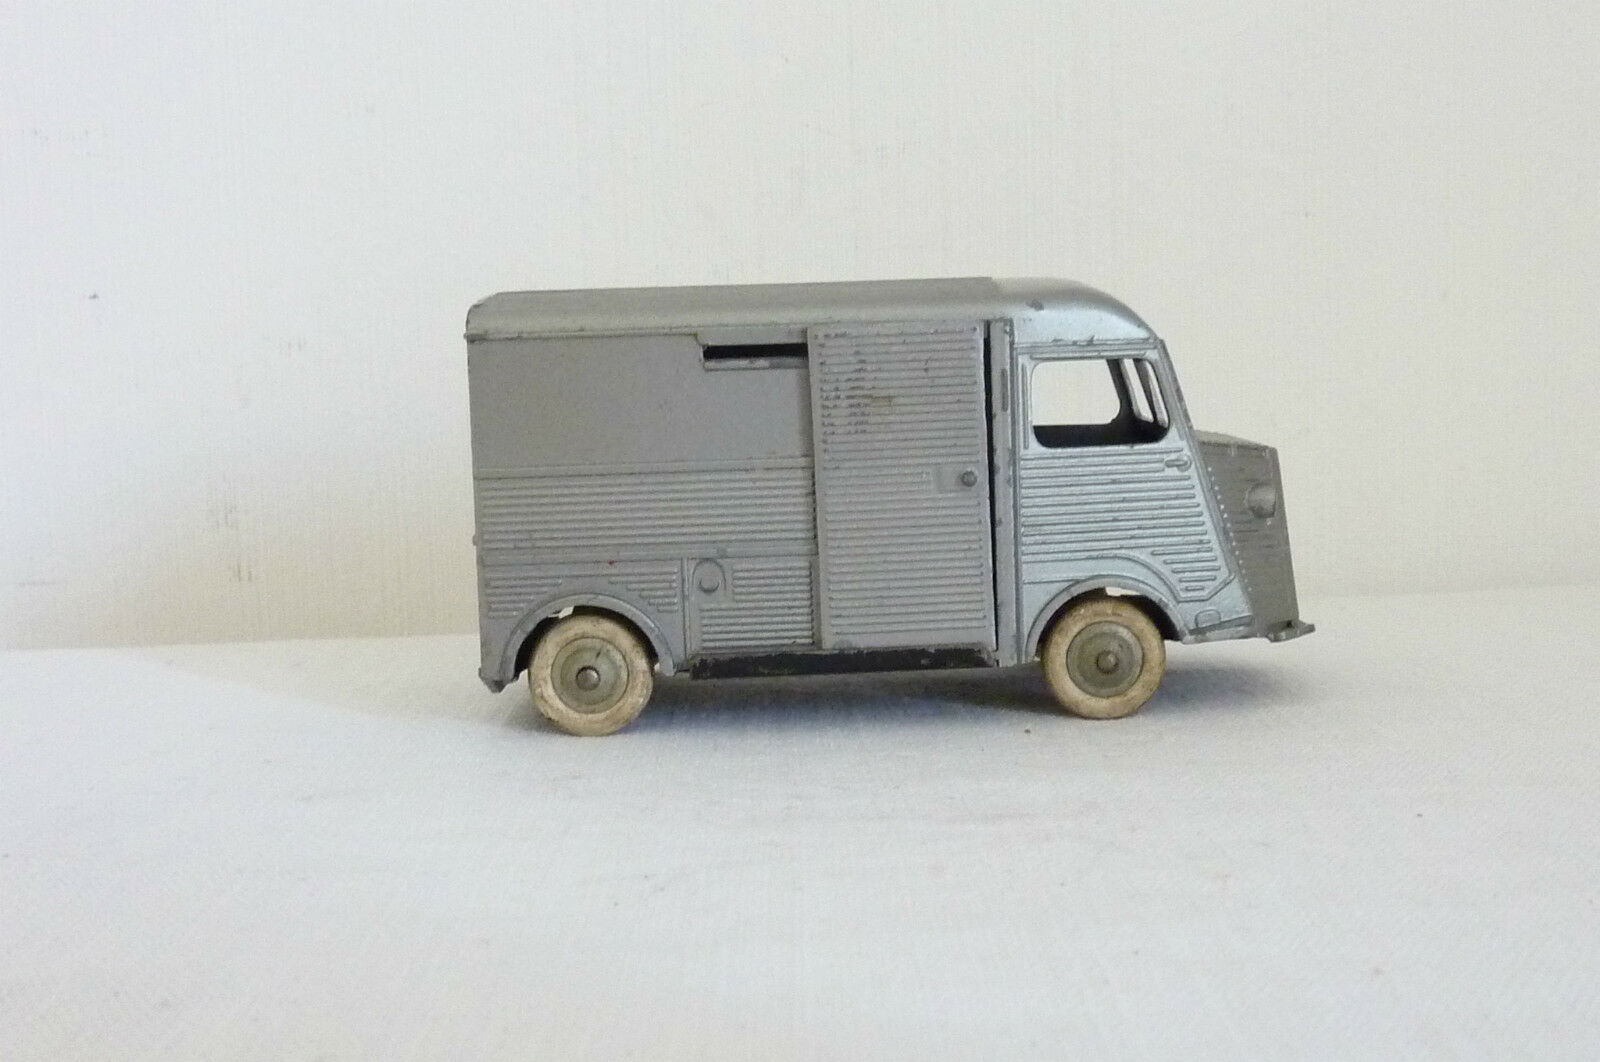 Ancien camion CITROËN TUBE 1200 KG JRD